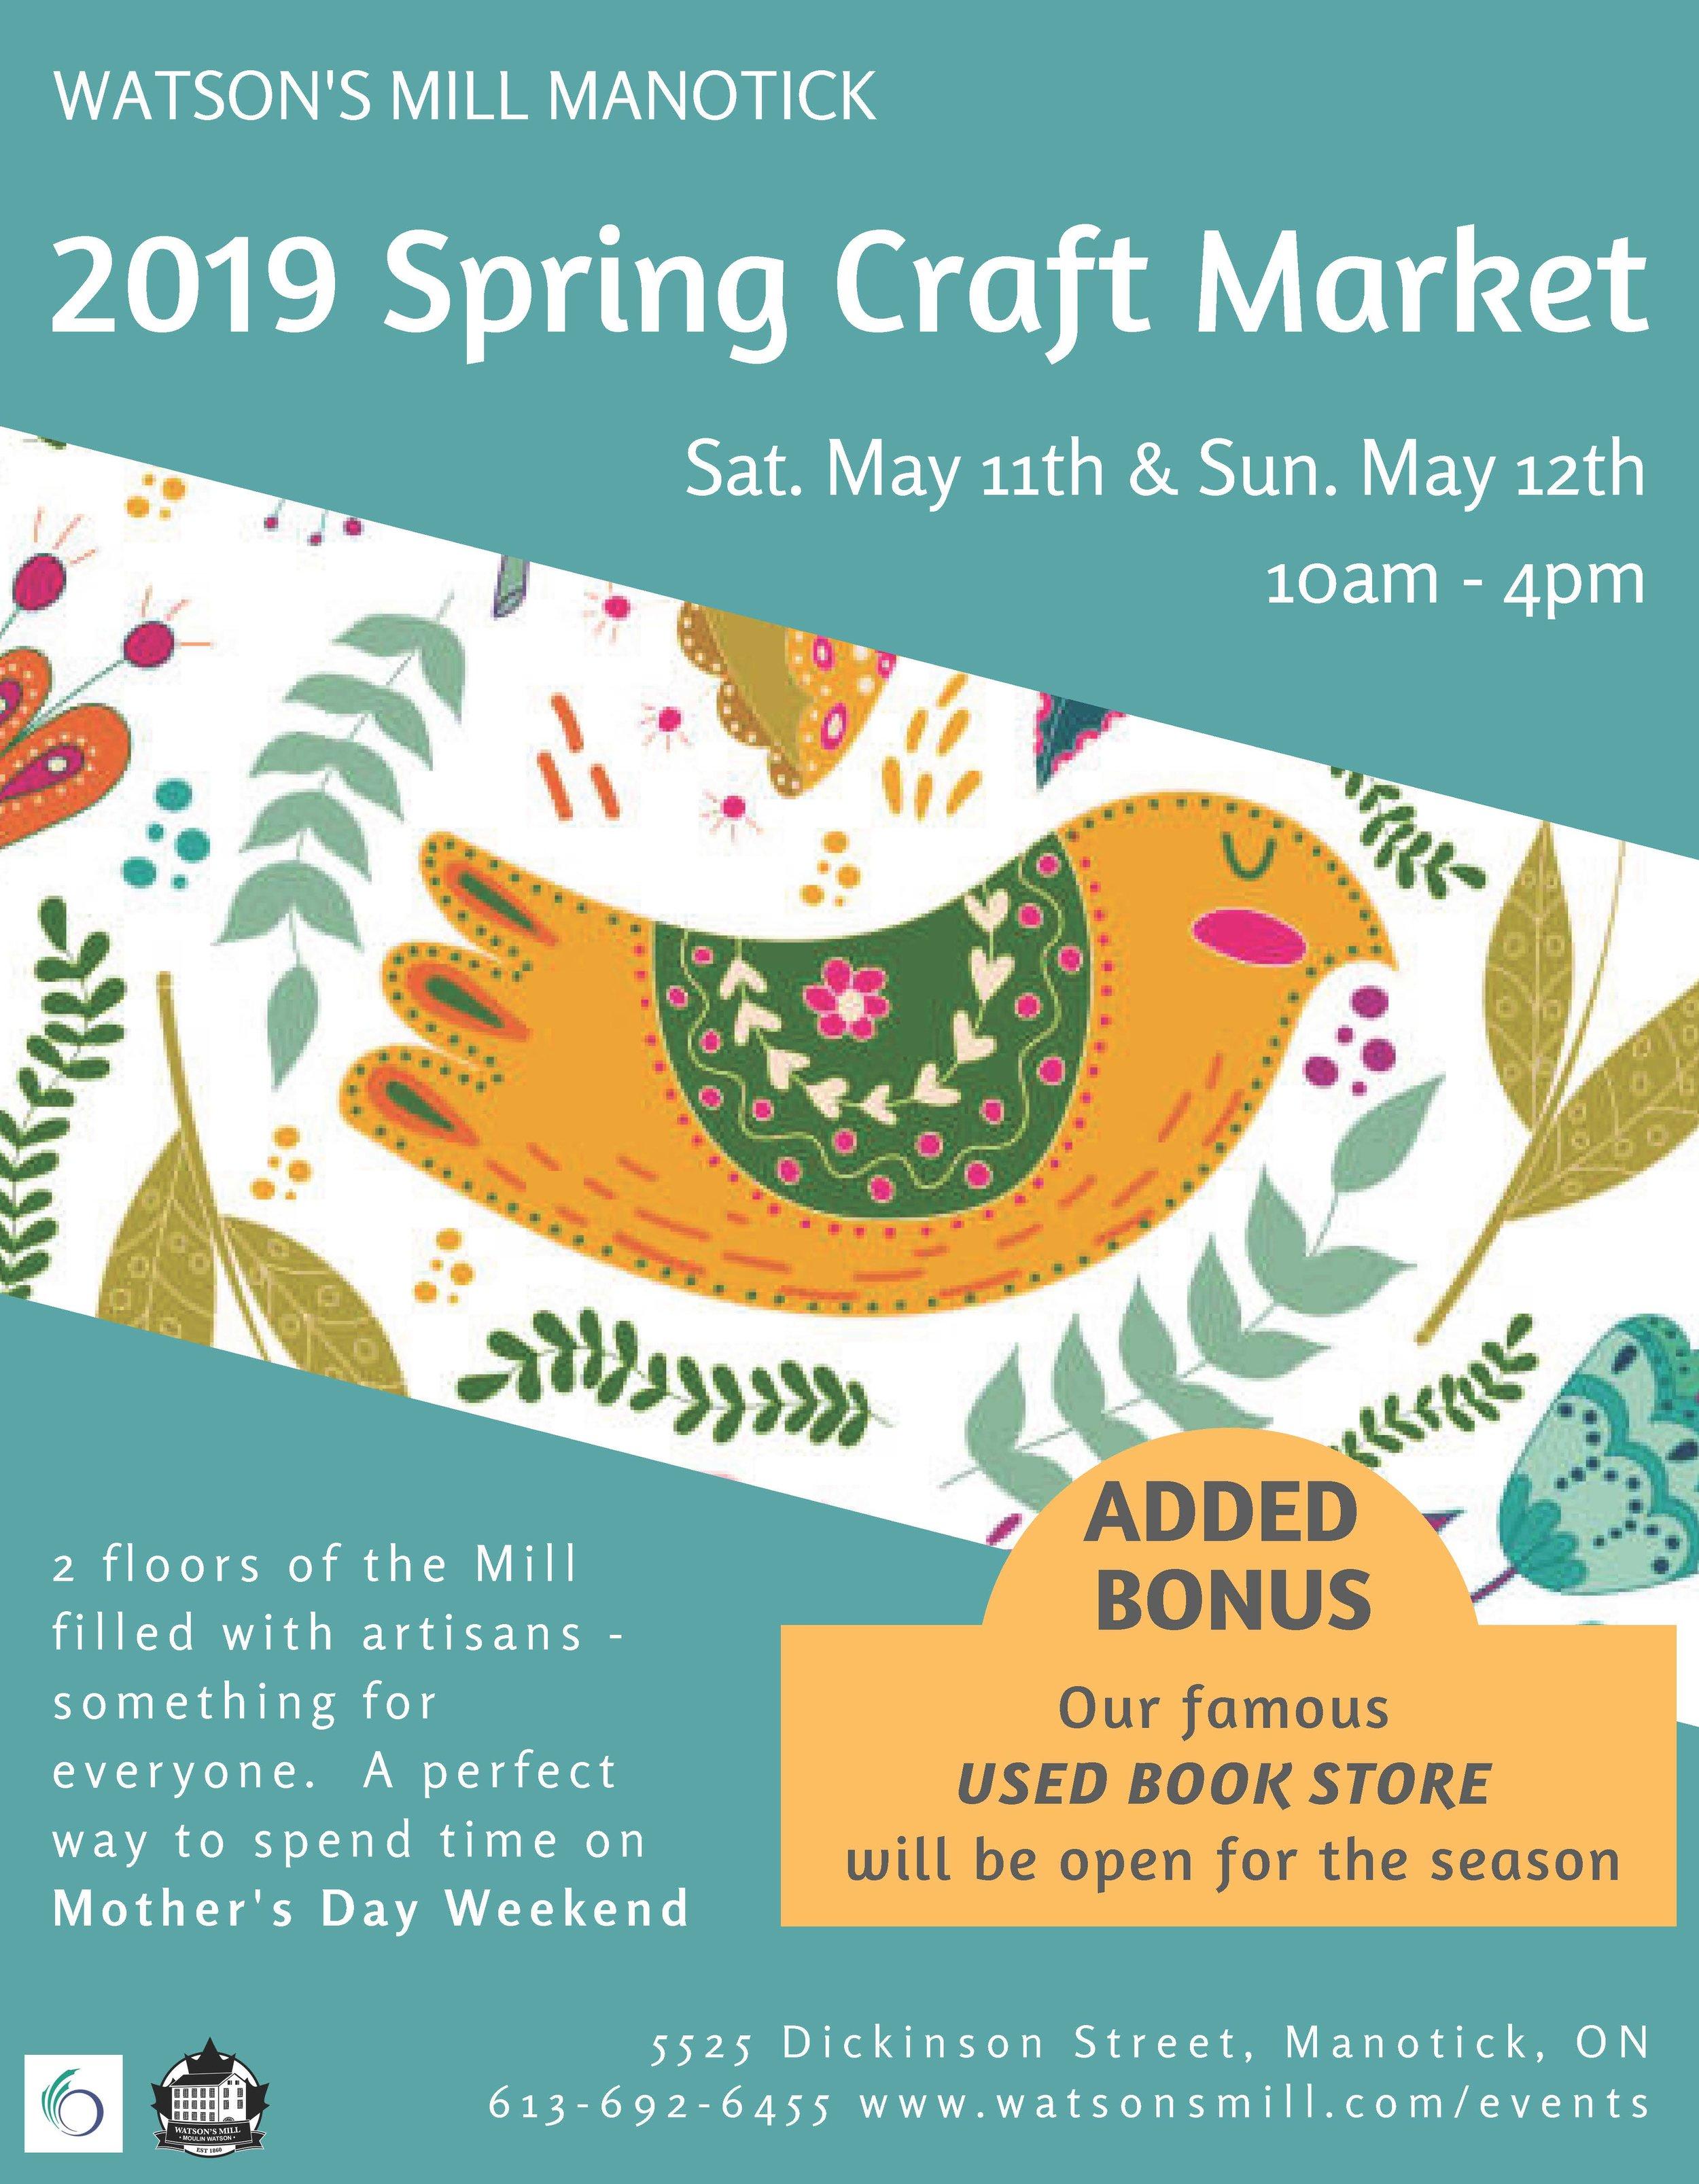 2019 Spring Craft Market Poster.jpg